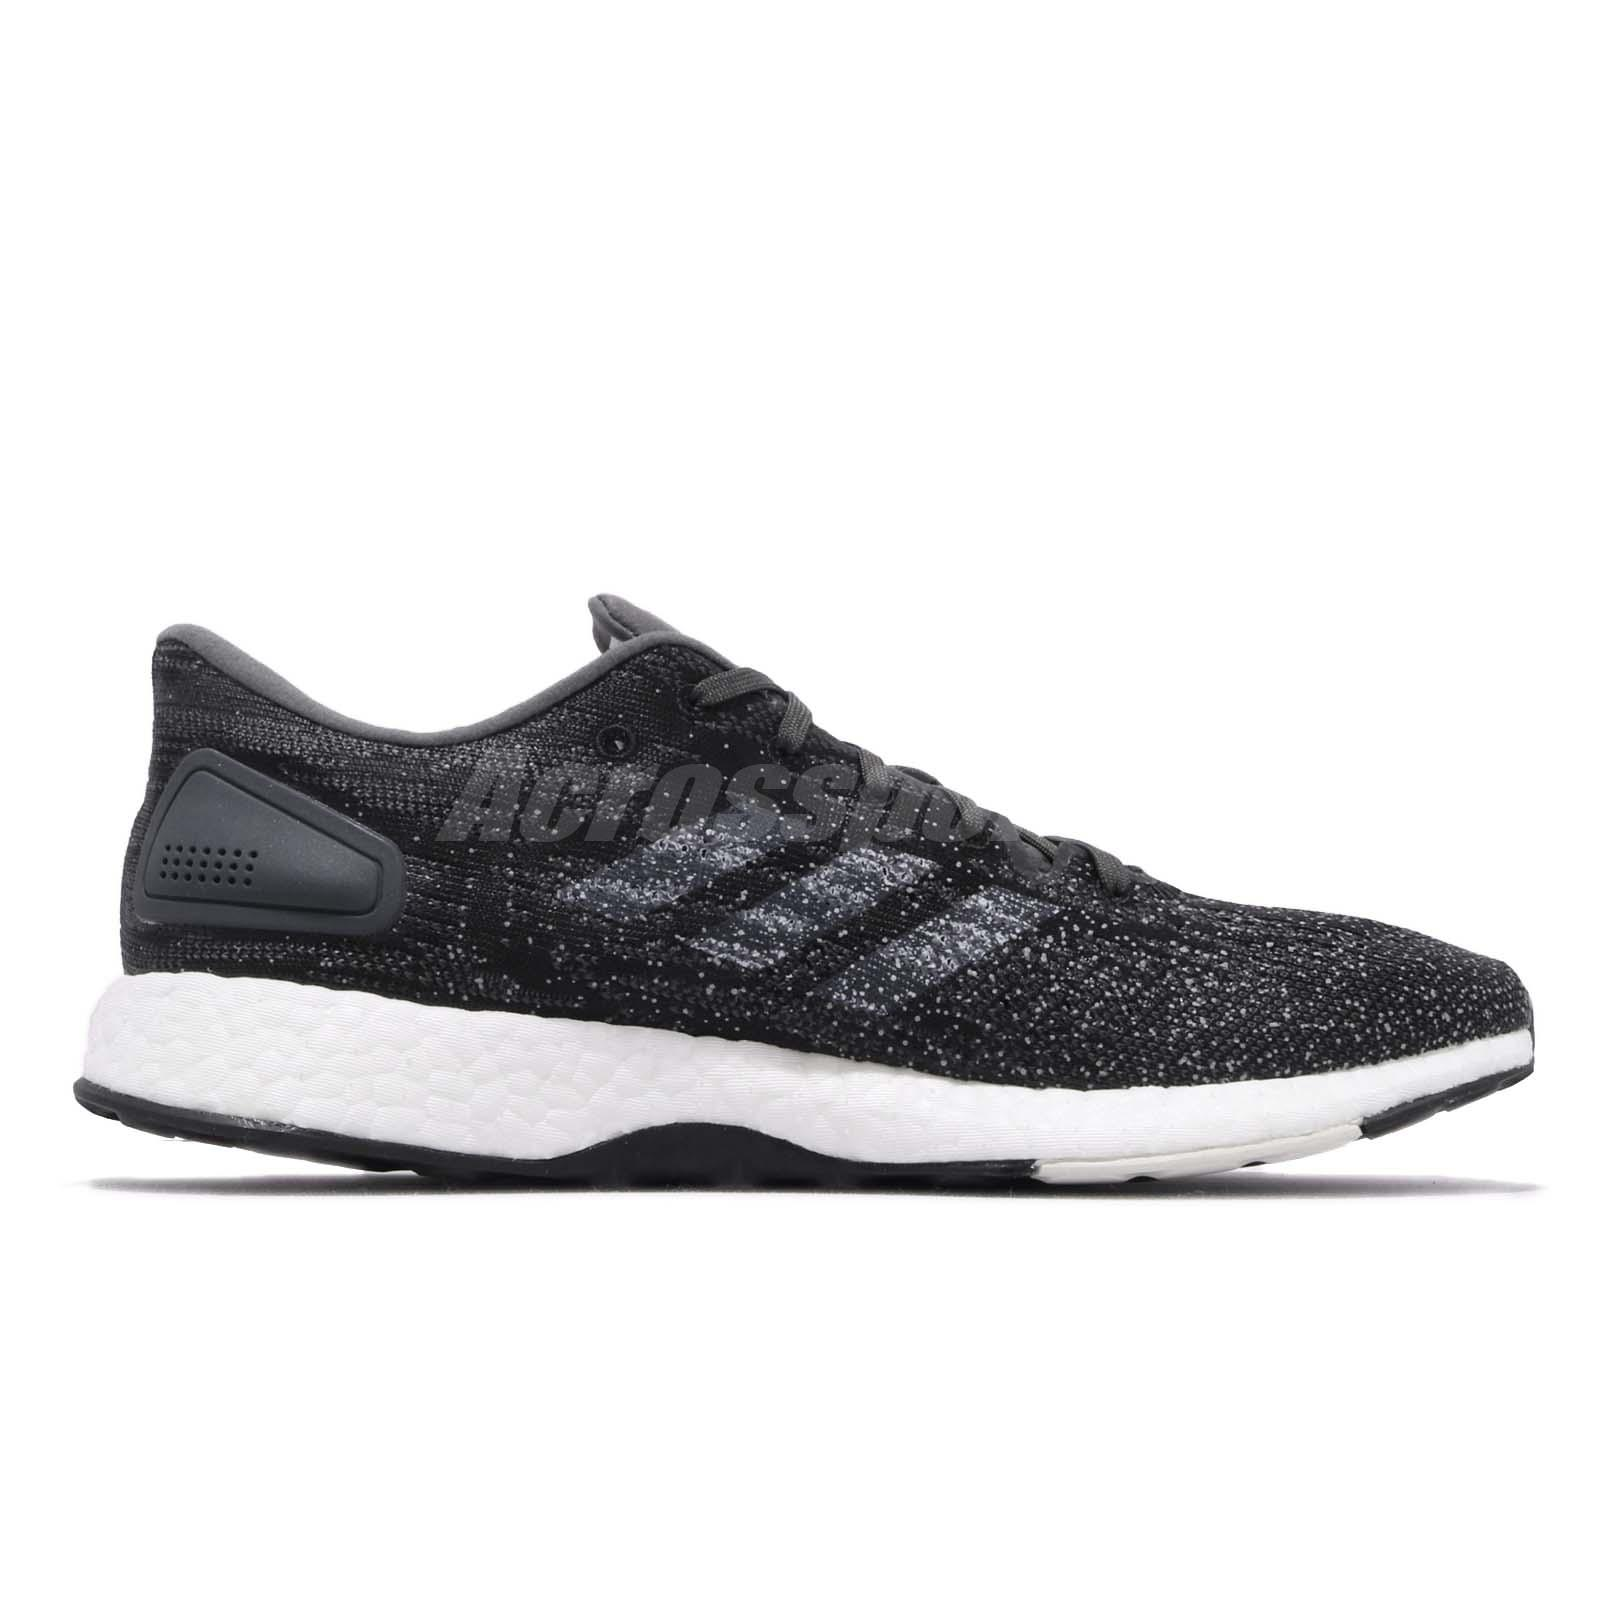 adidas PureBOOST DPR Grey White Men Running Training